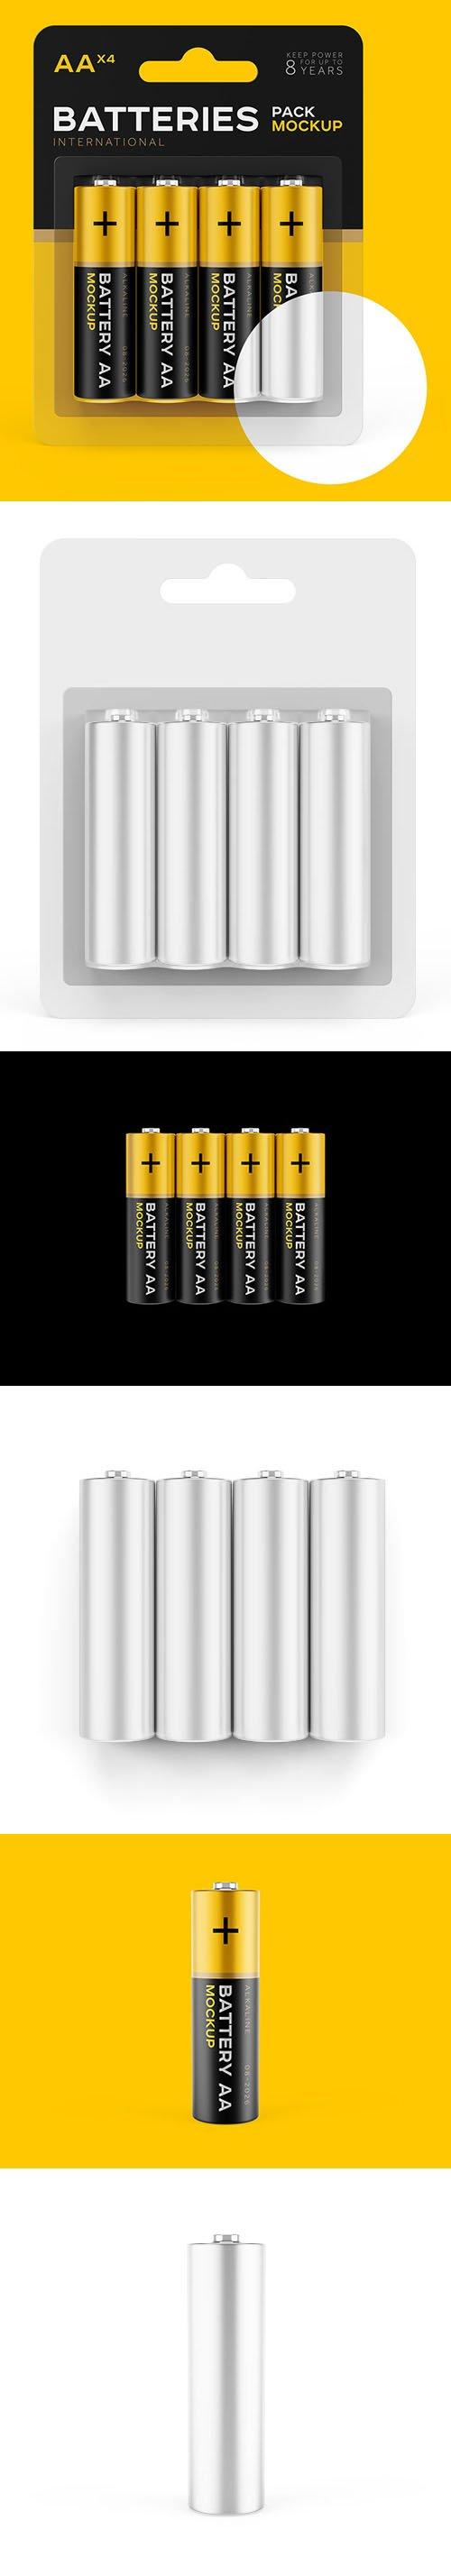 AAx4 Batteries Pack PSD Mockups Templates